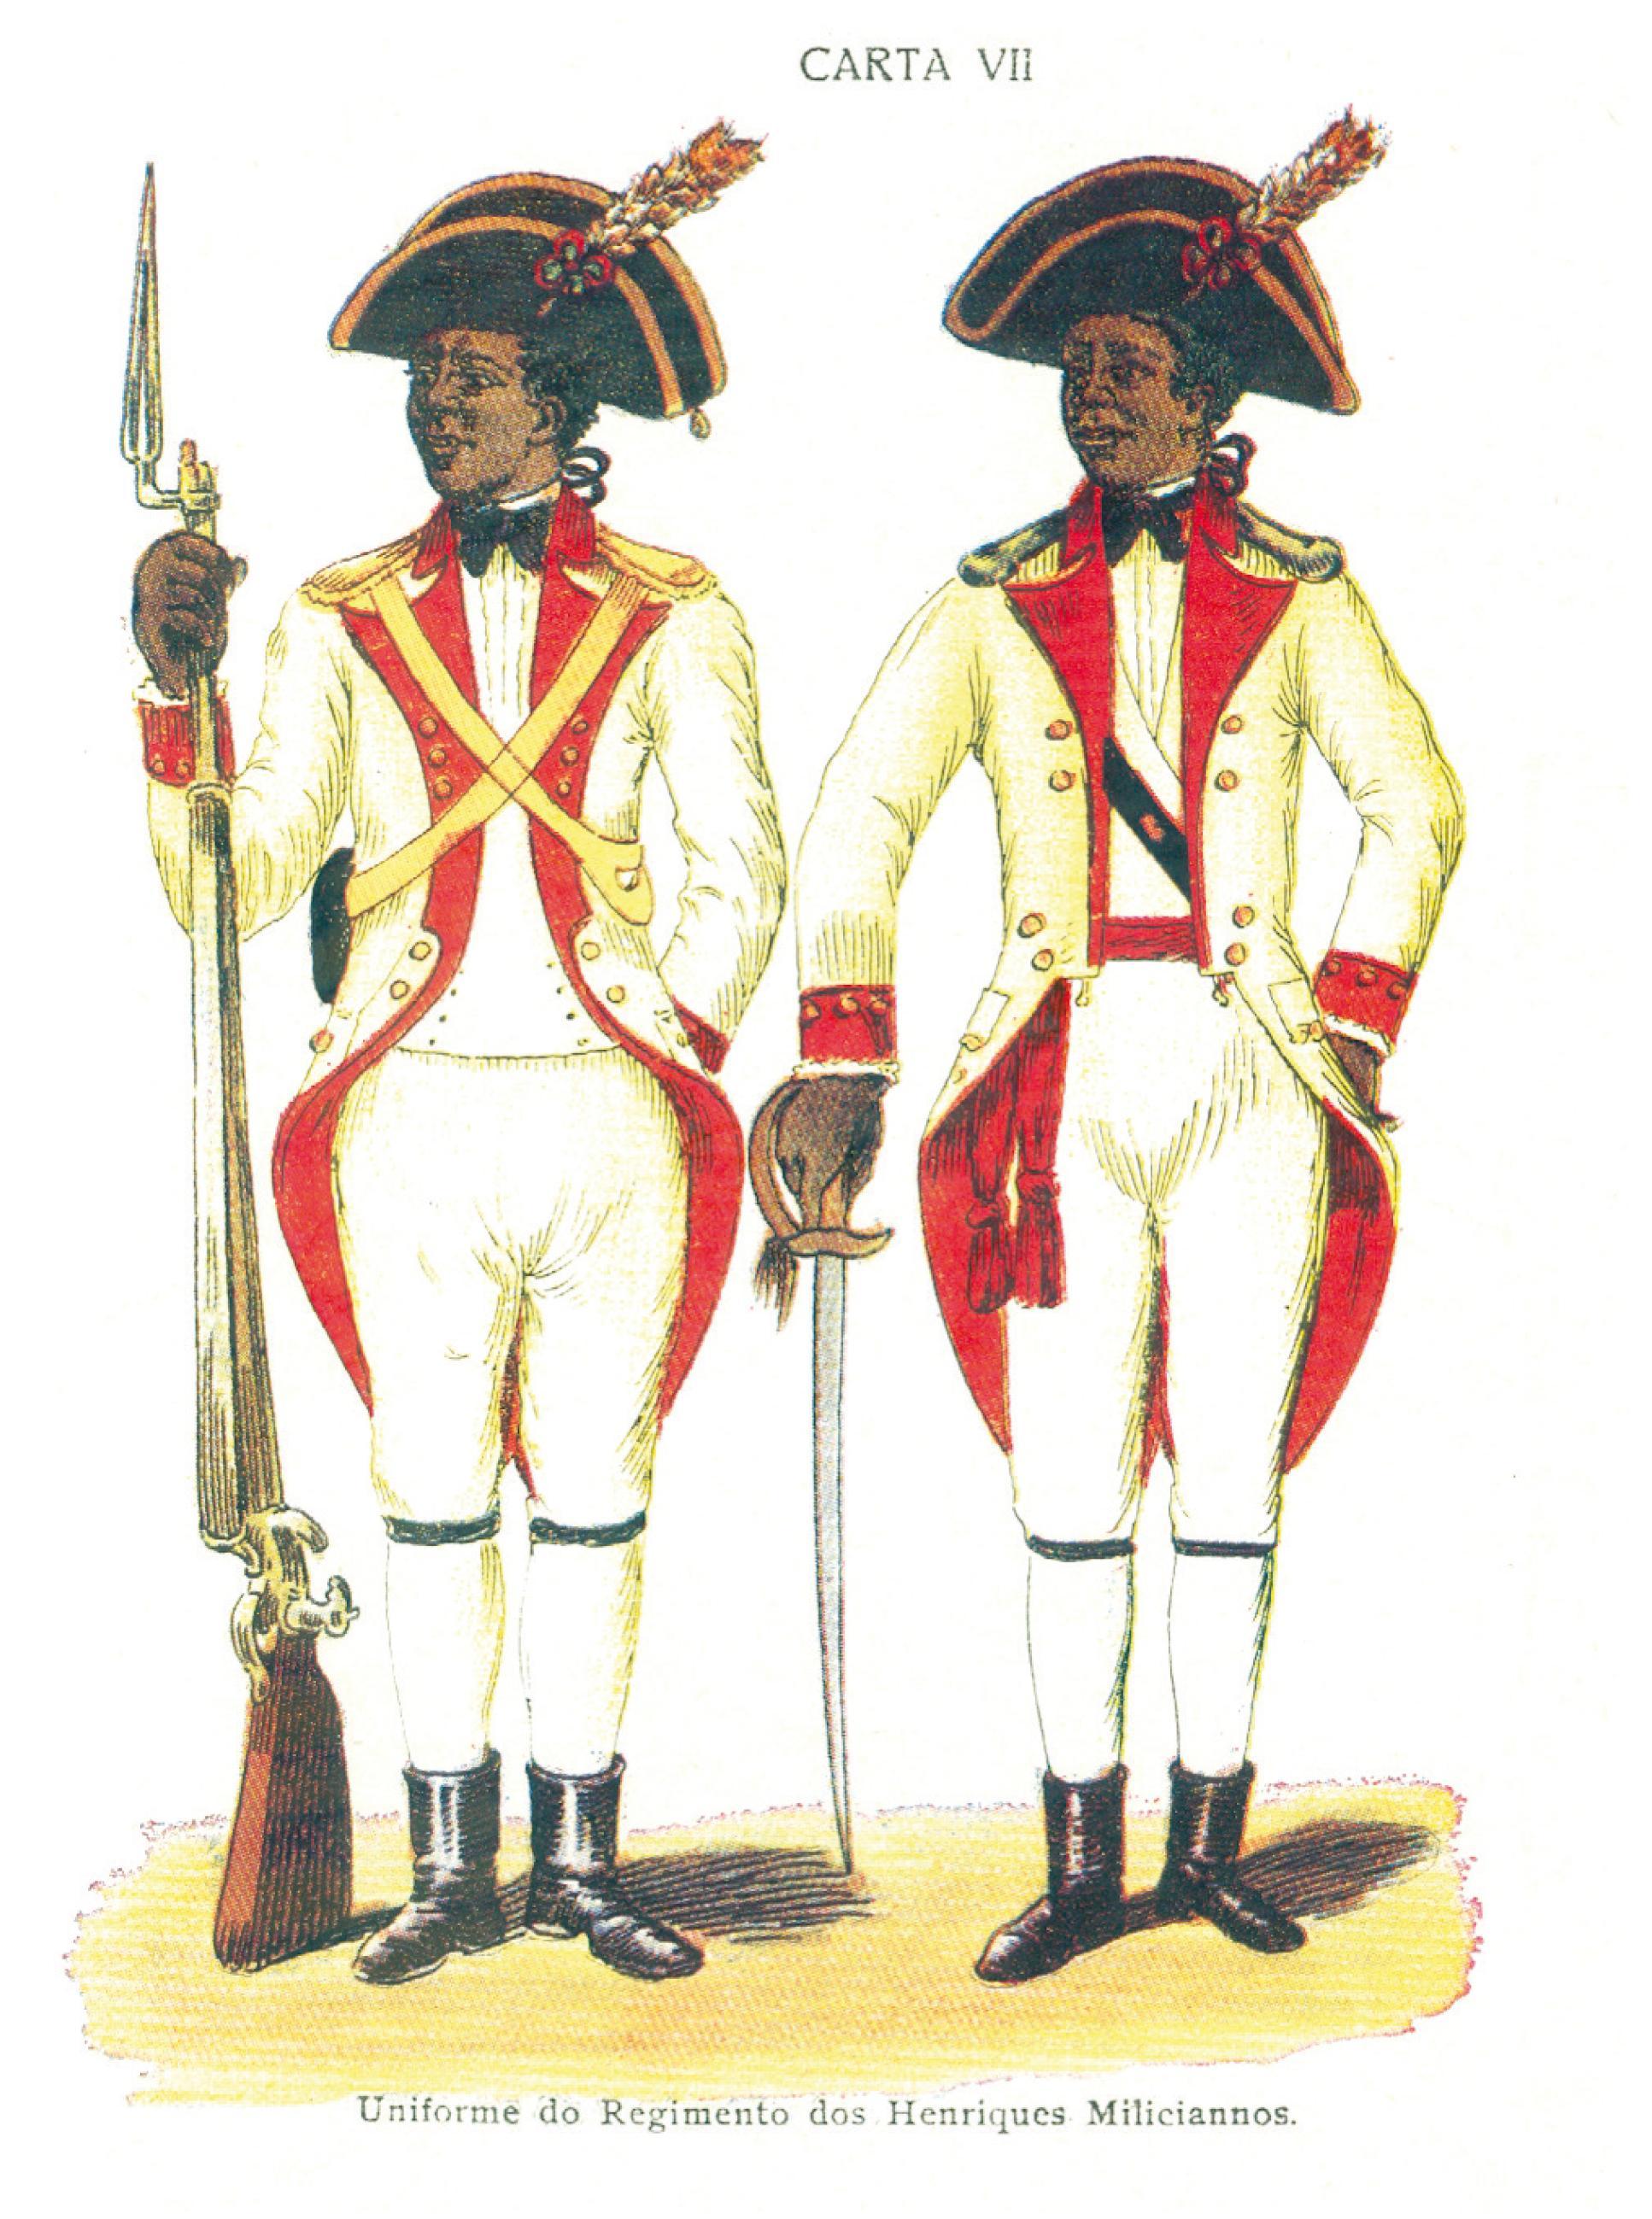 Free colored soldiers. Source: Luis dos Santos Vilhena, A Bahia no Século XVIII (Editôra Itapuã: Bahia, 1969).